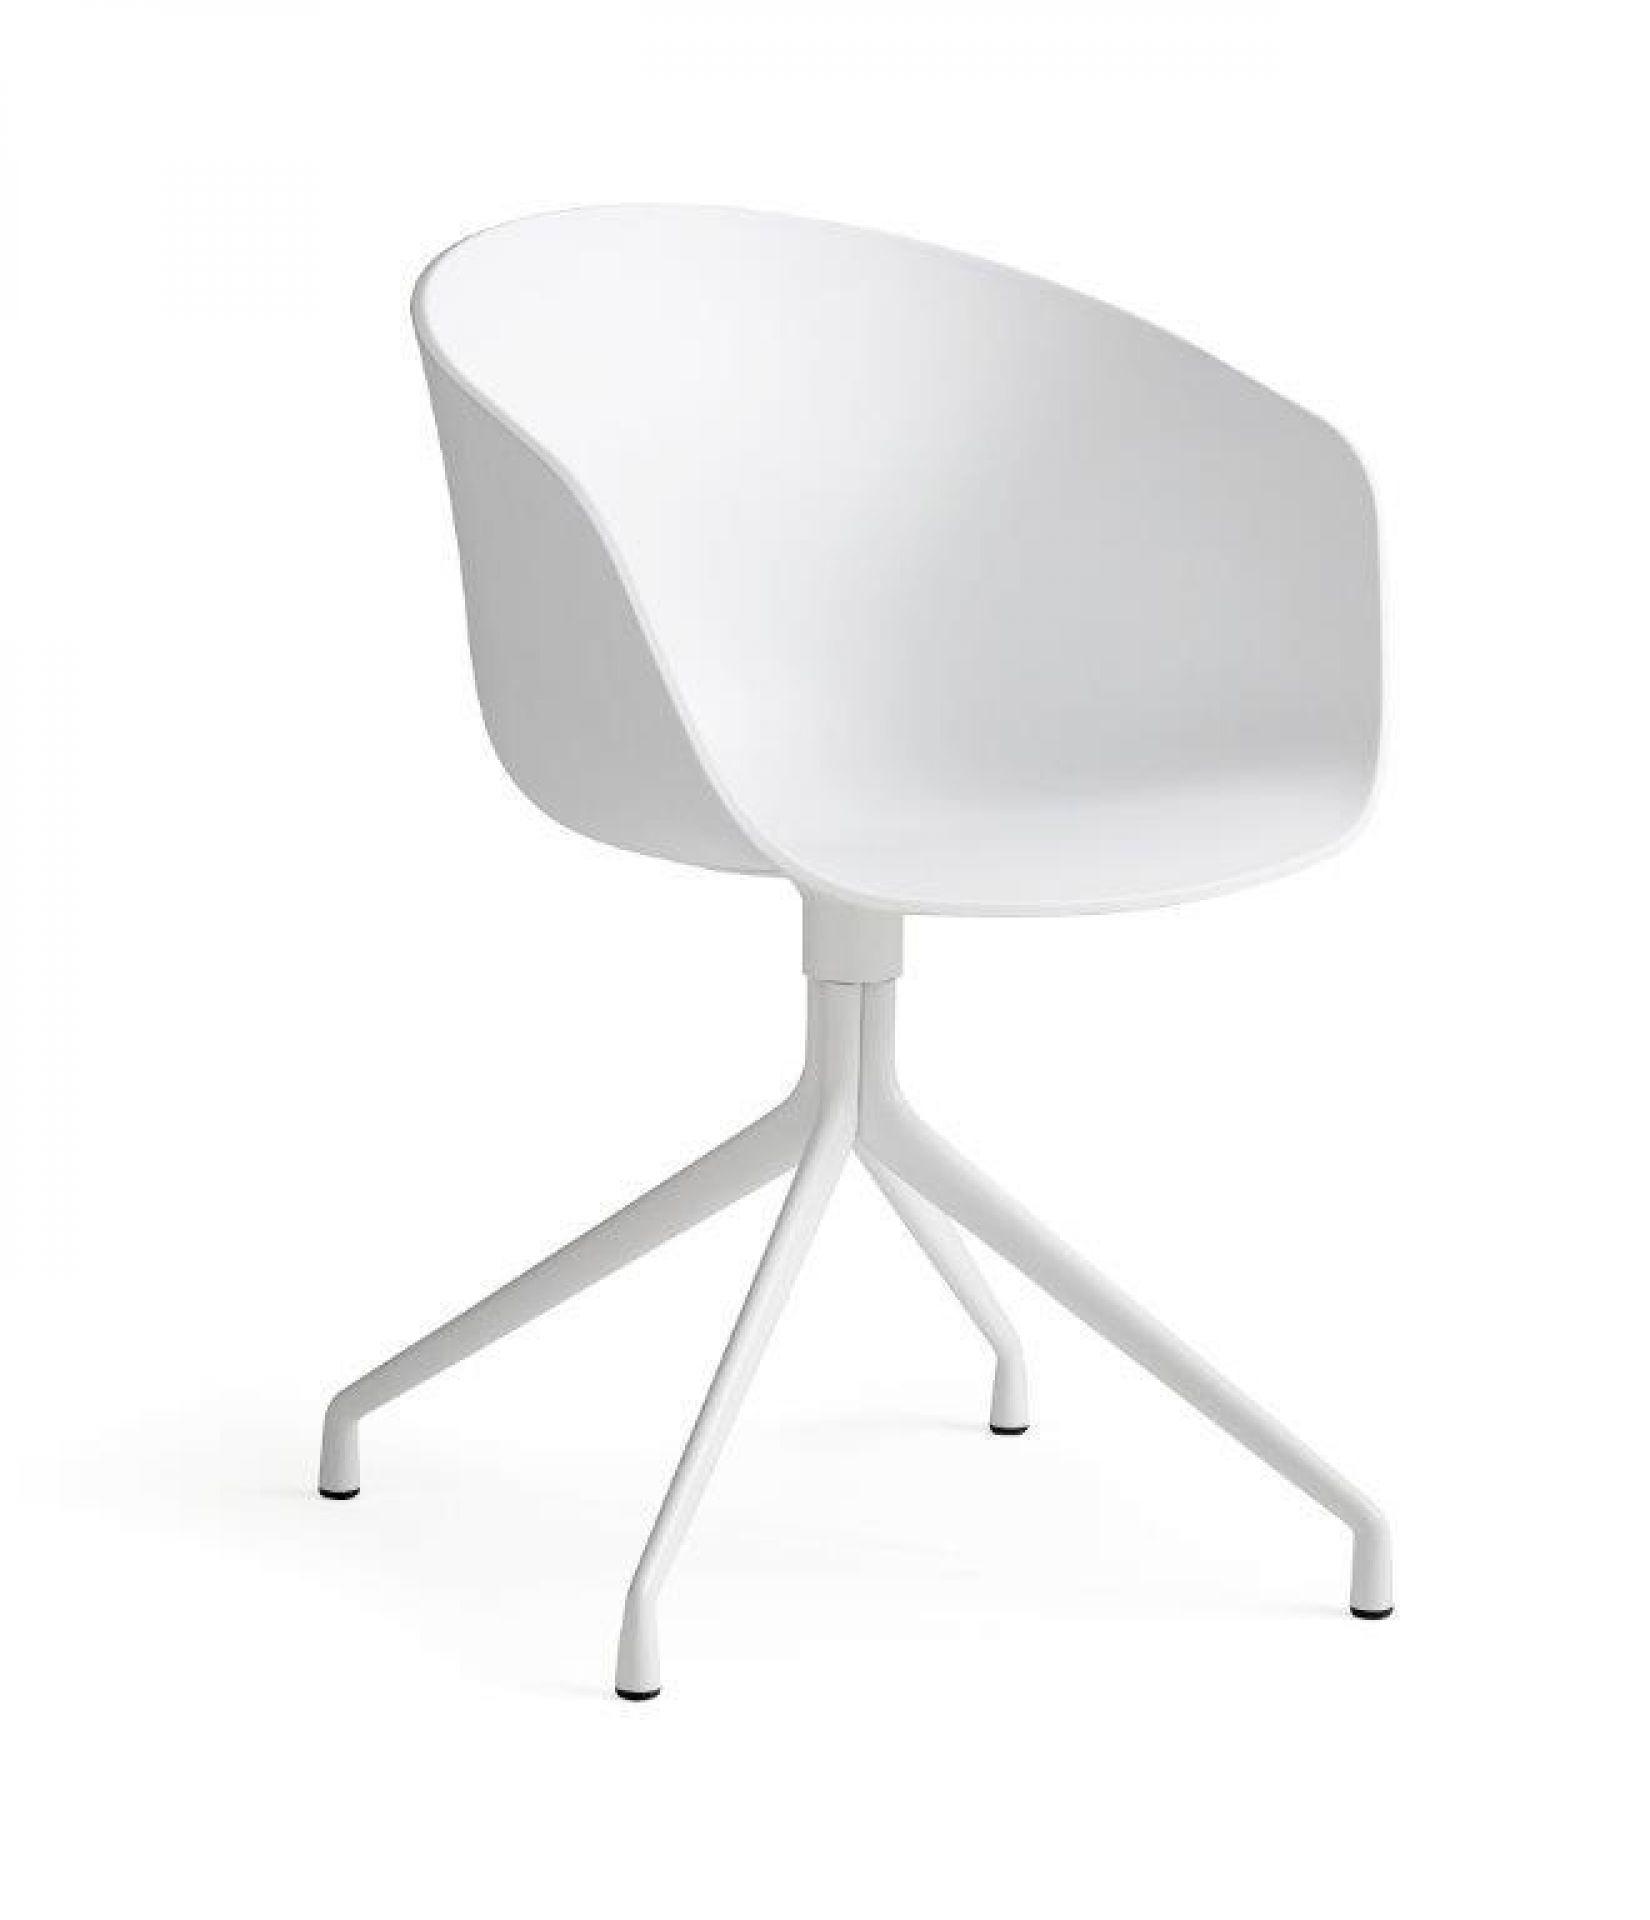 About A Chair AAC20 / AAC 20 Stuhl Schwarz Gestell schwarz pulverbeschichtet Hay